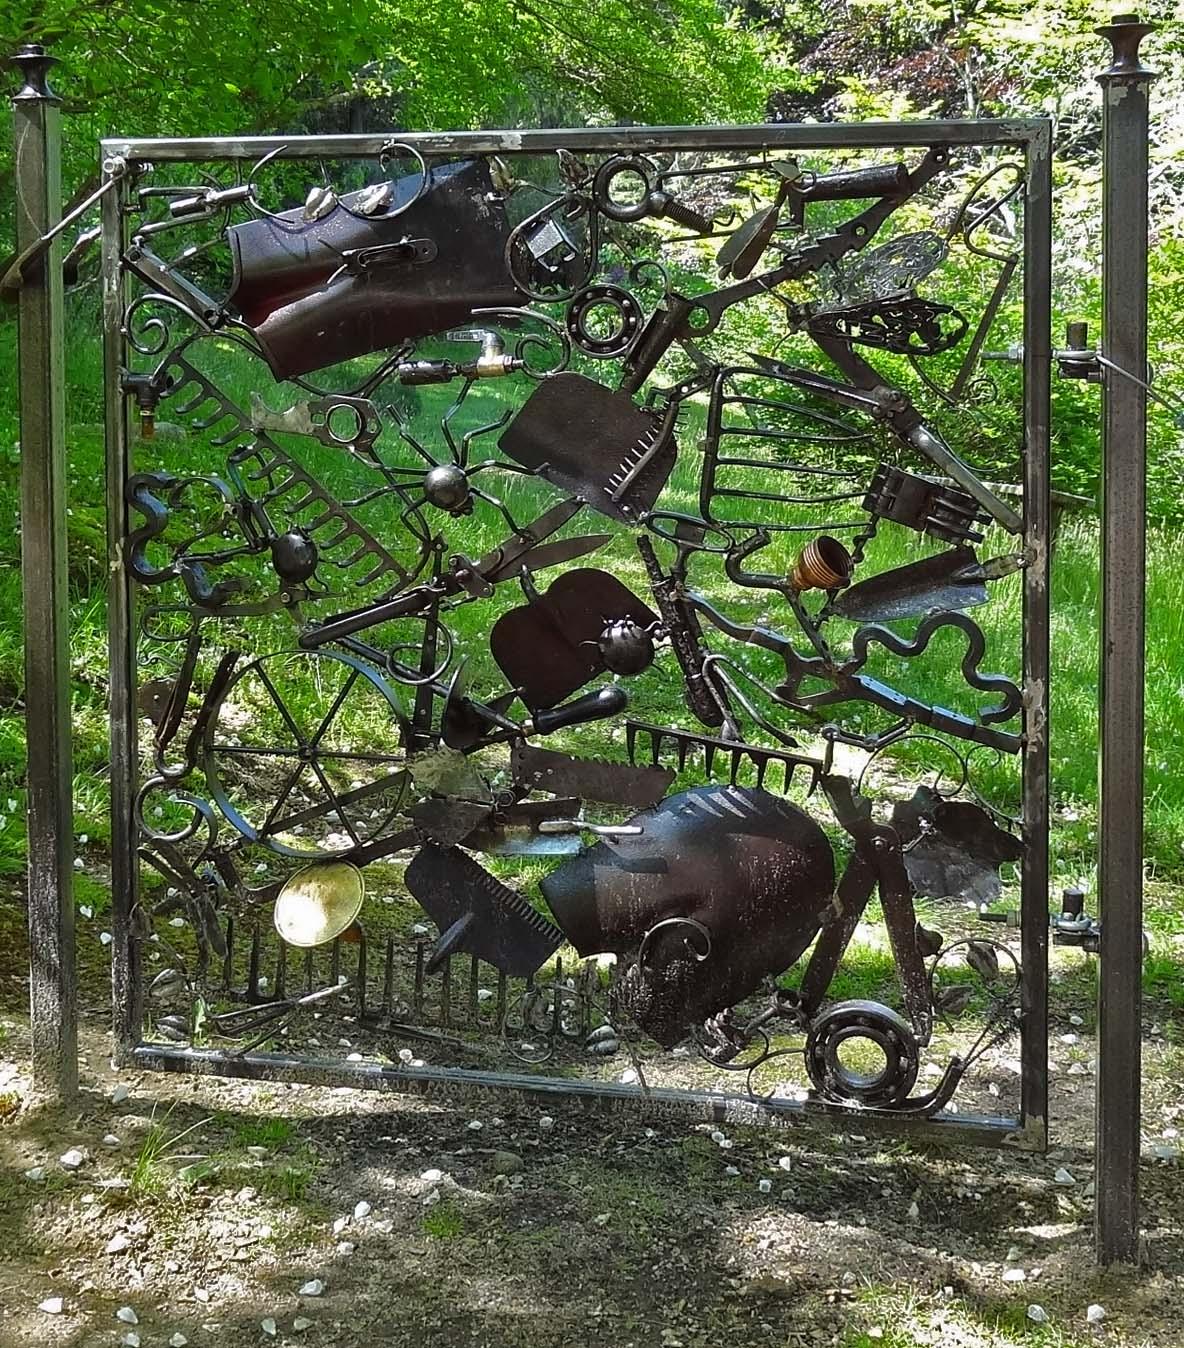 Wooden Tree Gate Design: Joe's Retirement Blog: Whimsical Gates, Heritage Museums